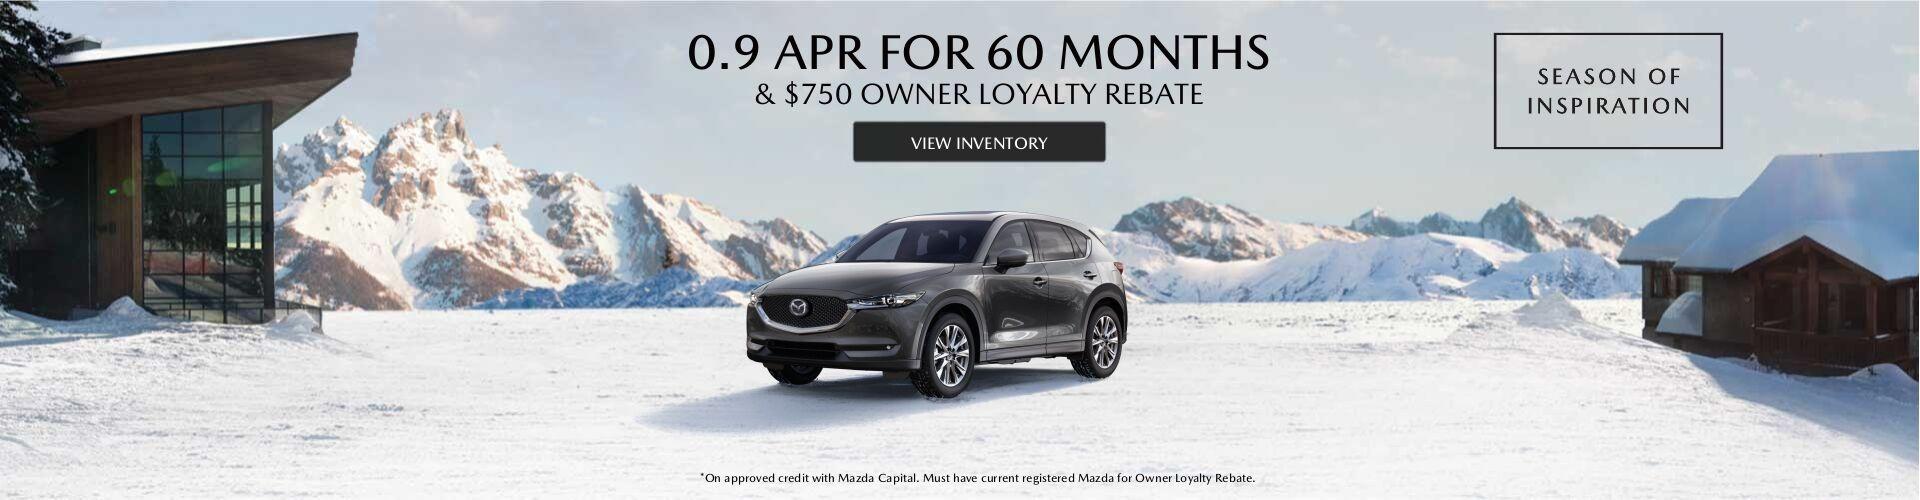 Mazda Dealerships In Georgia >> Mazda Dealership Savannah Ga Used Cars Fairway Mazda